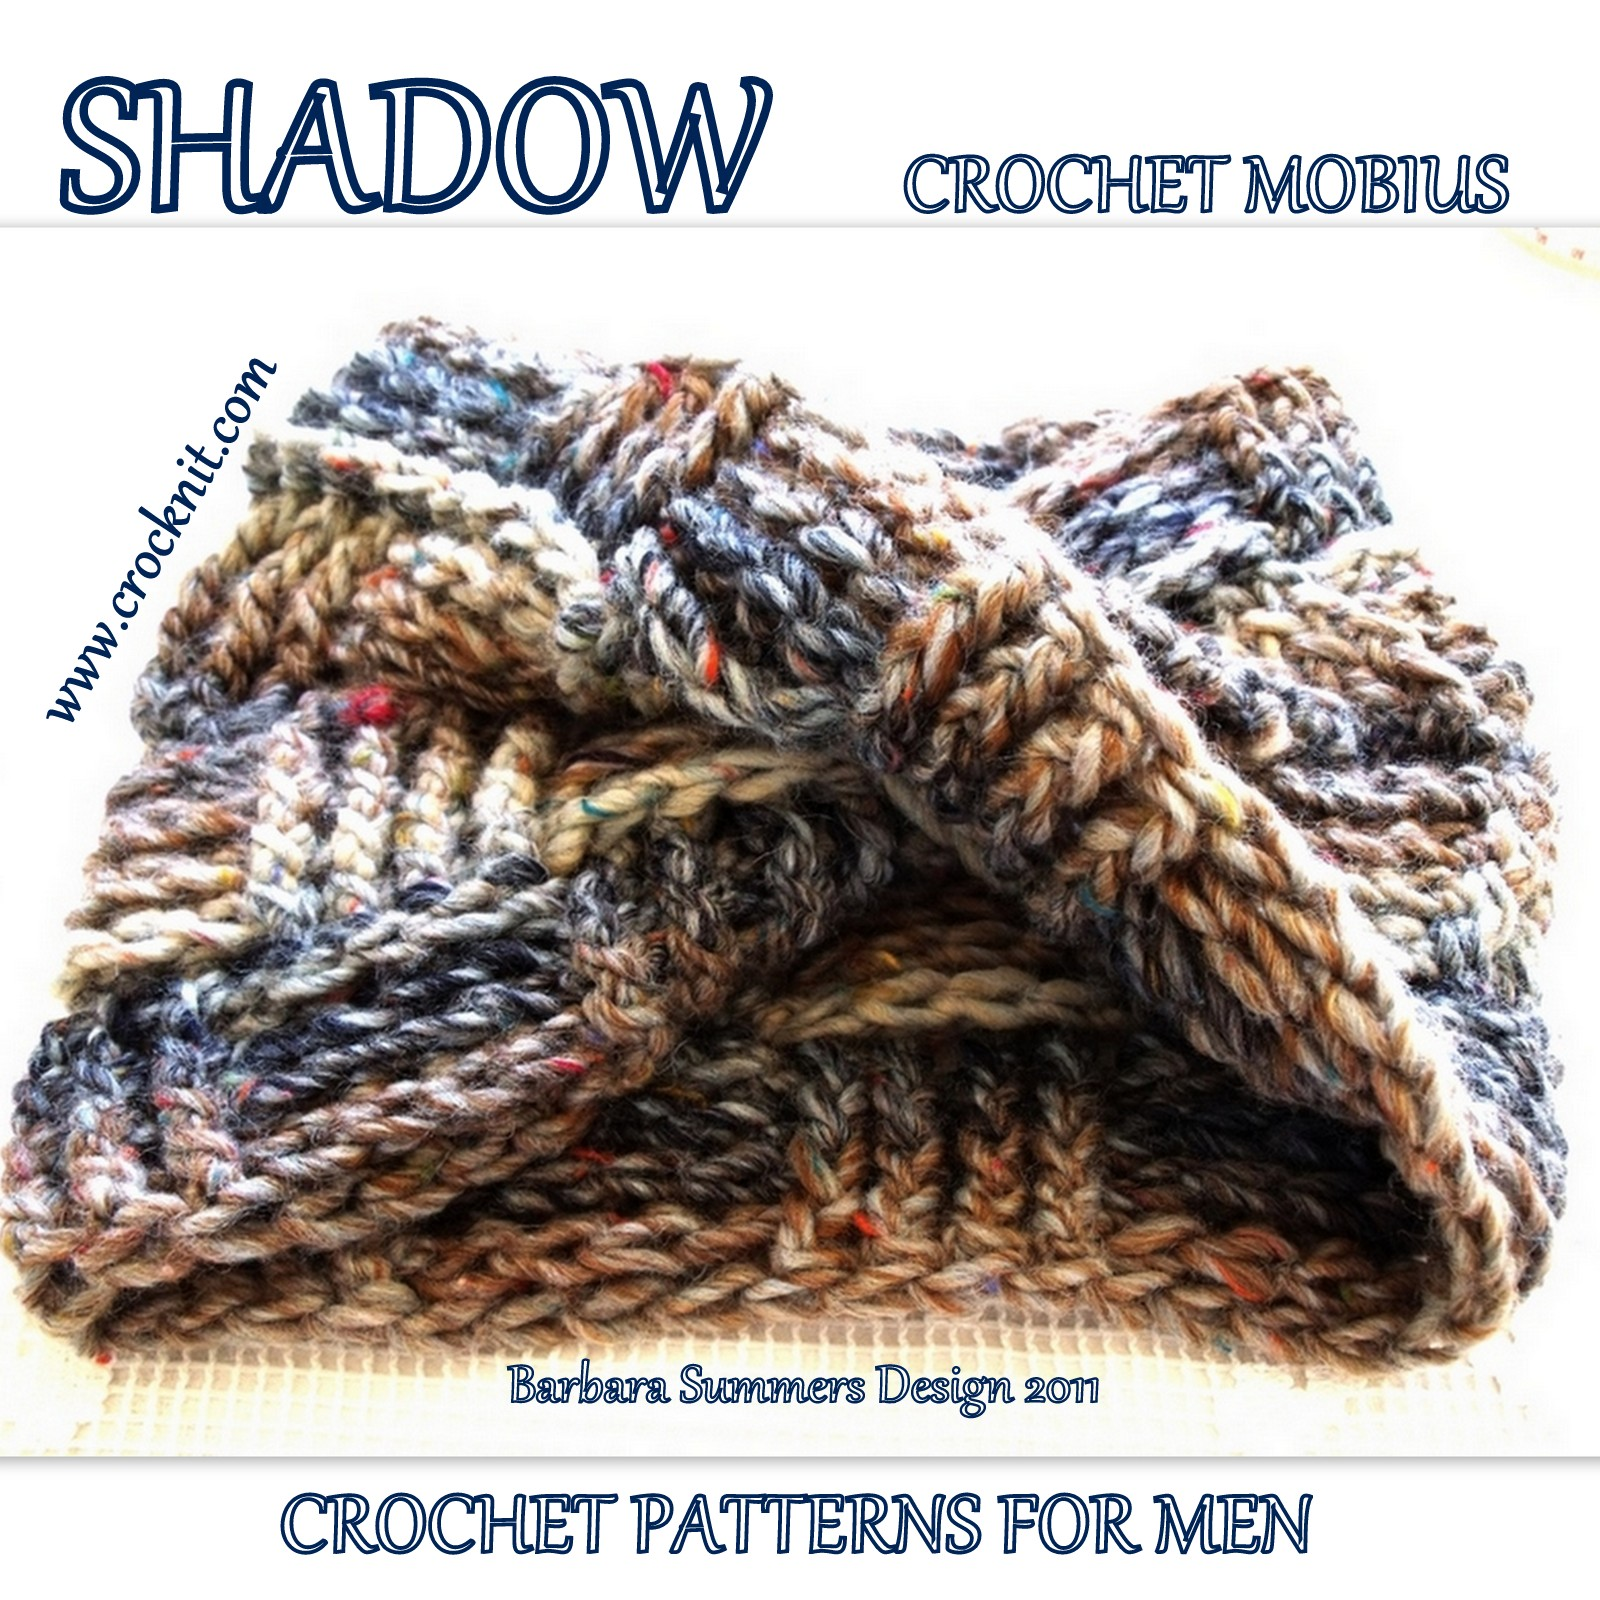 MICROCKNIT CREATIONS: Crochet for Men!